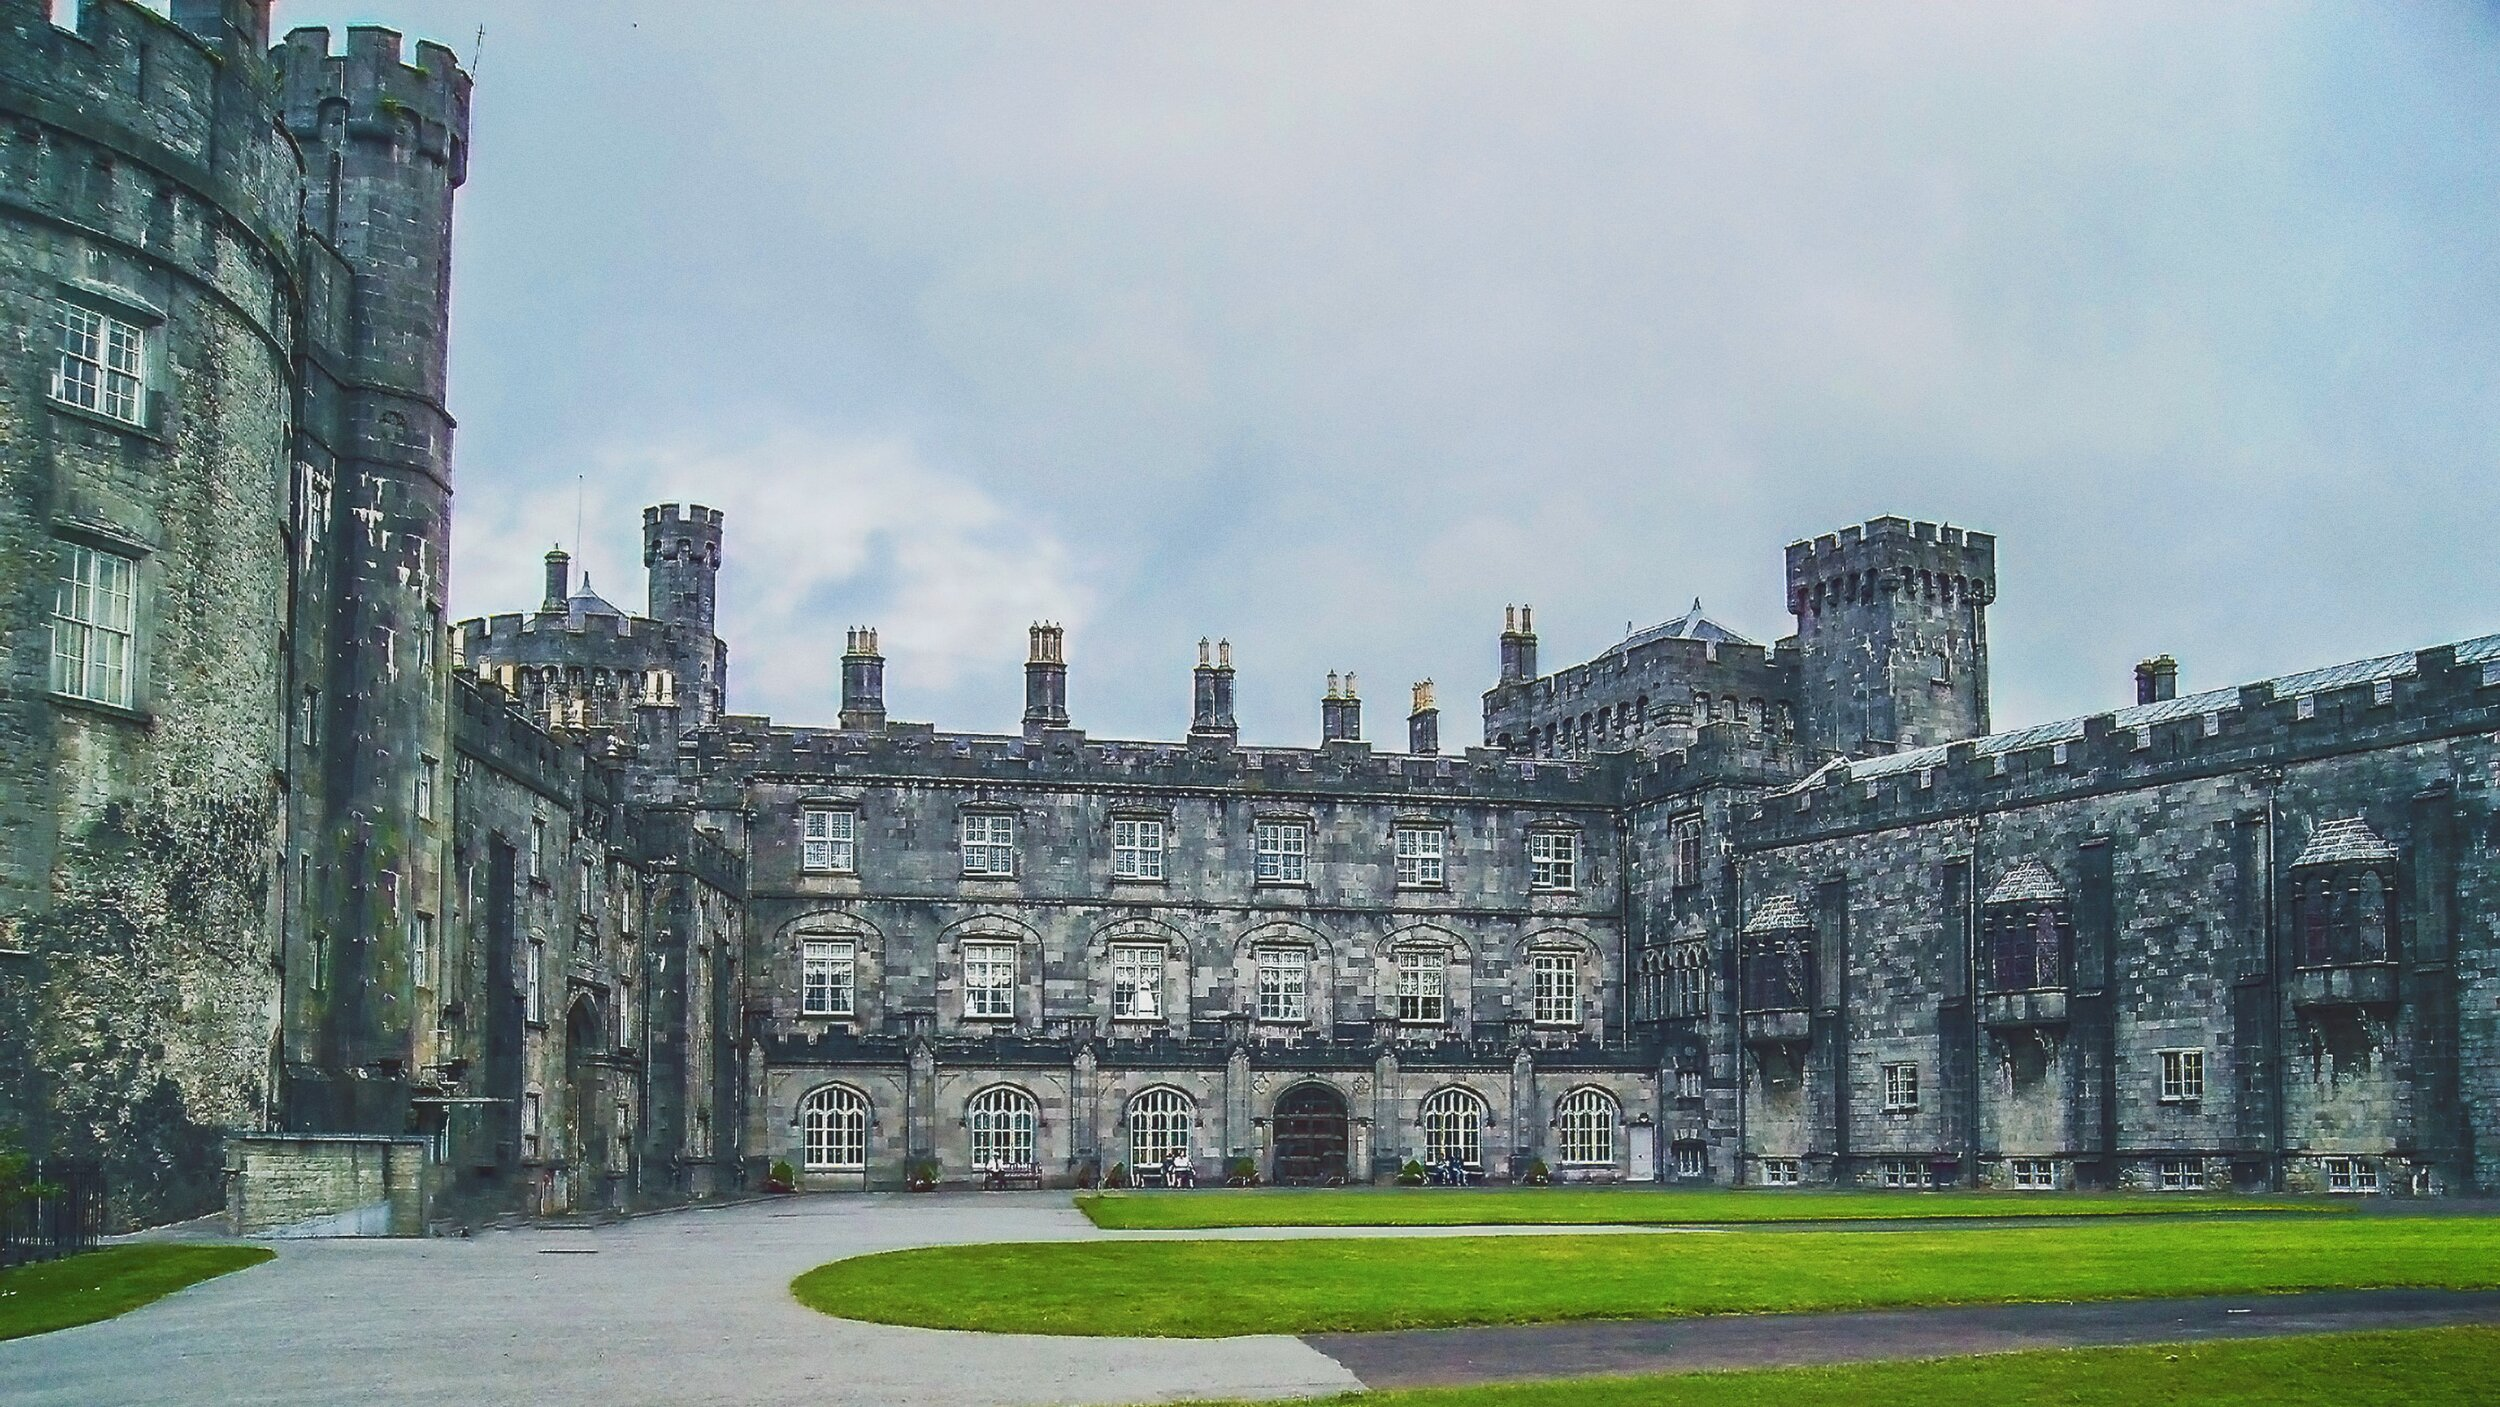 Academic - Kilkenny College